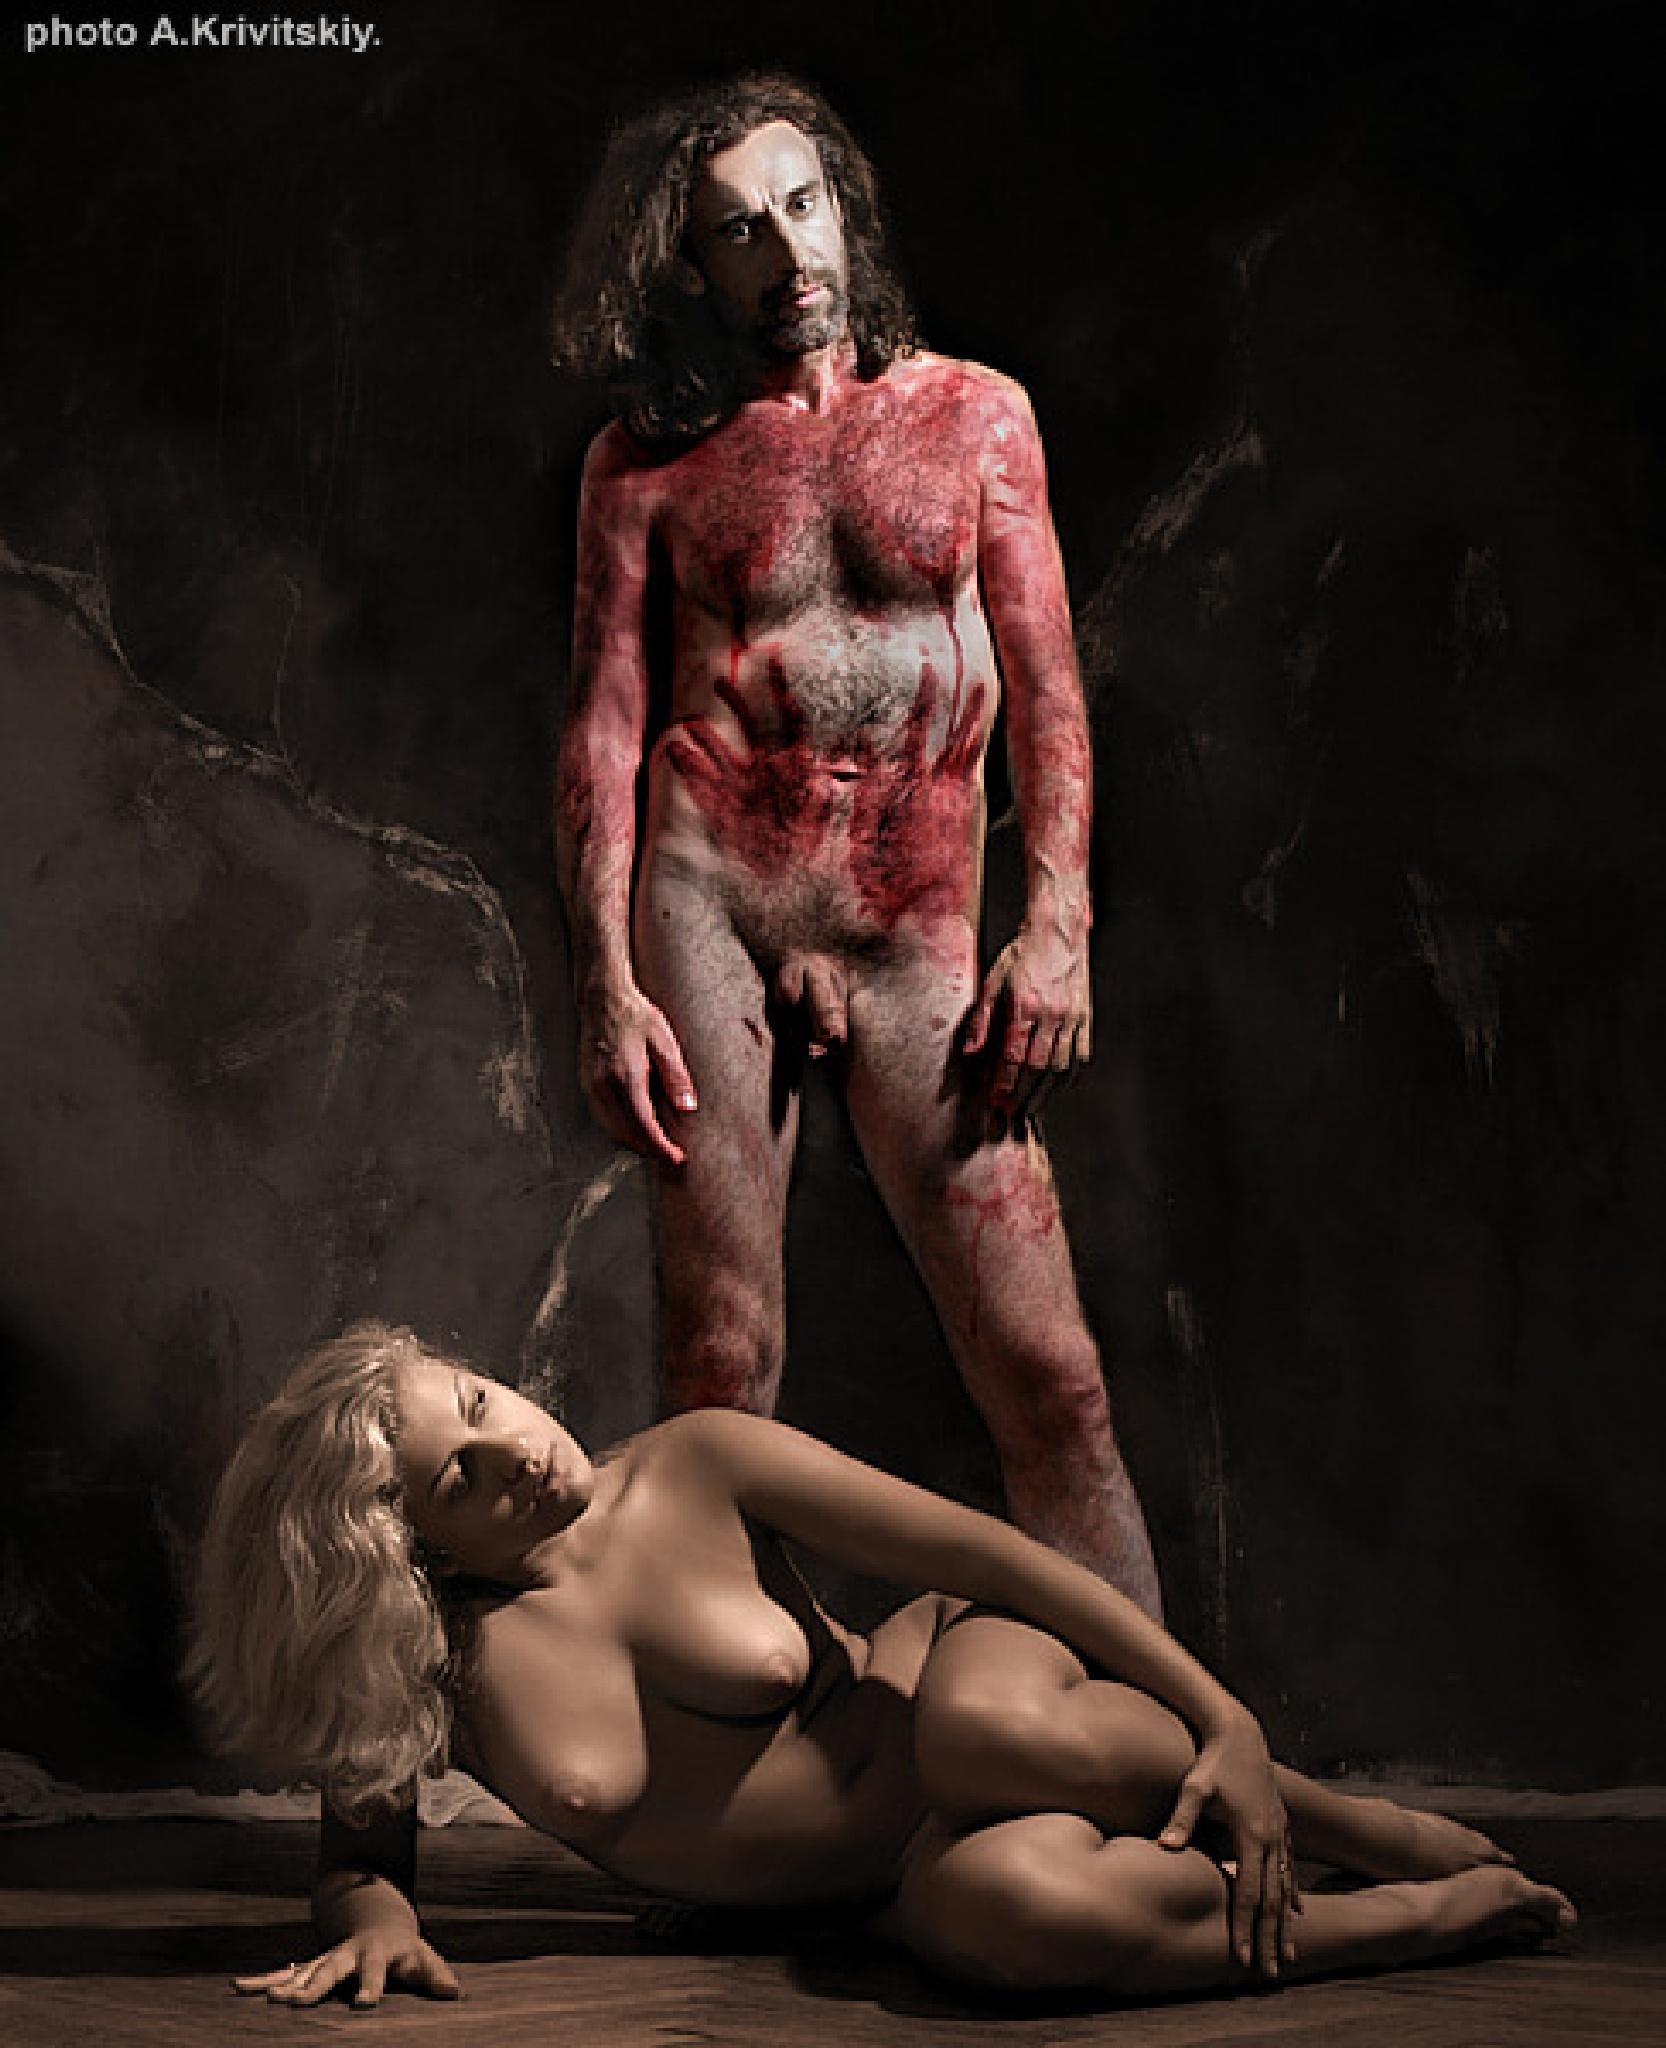 The image object, phenomenon, depicting someone sth .. by krivitskiy